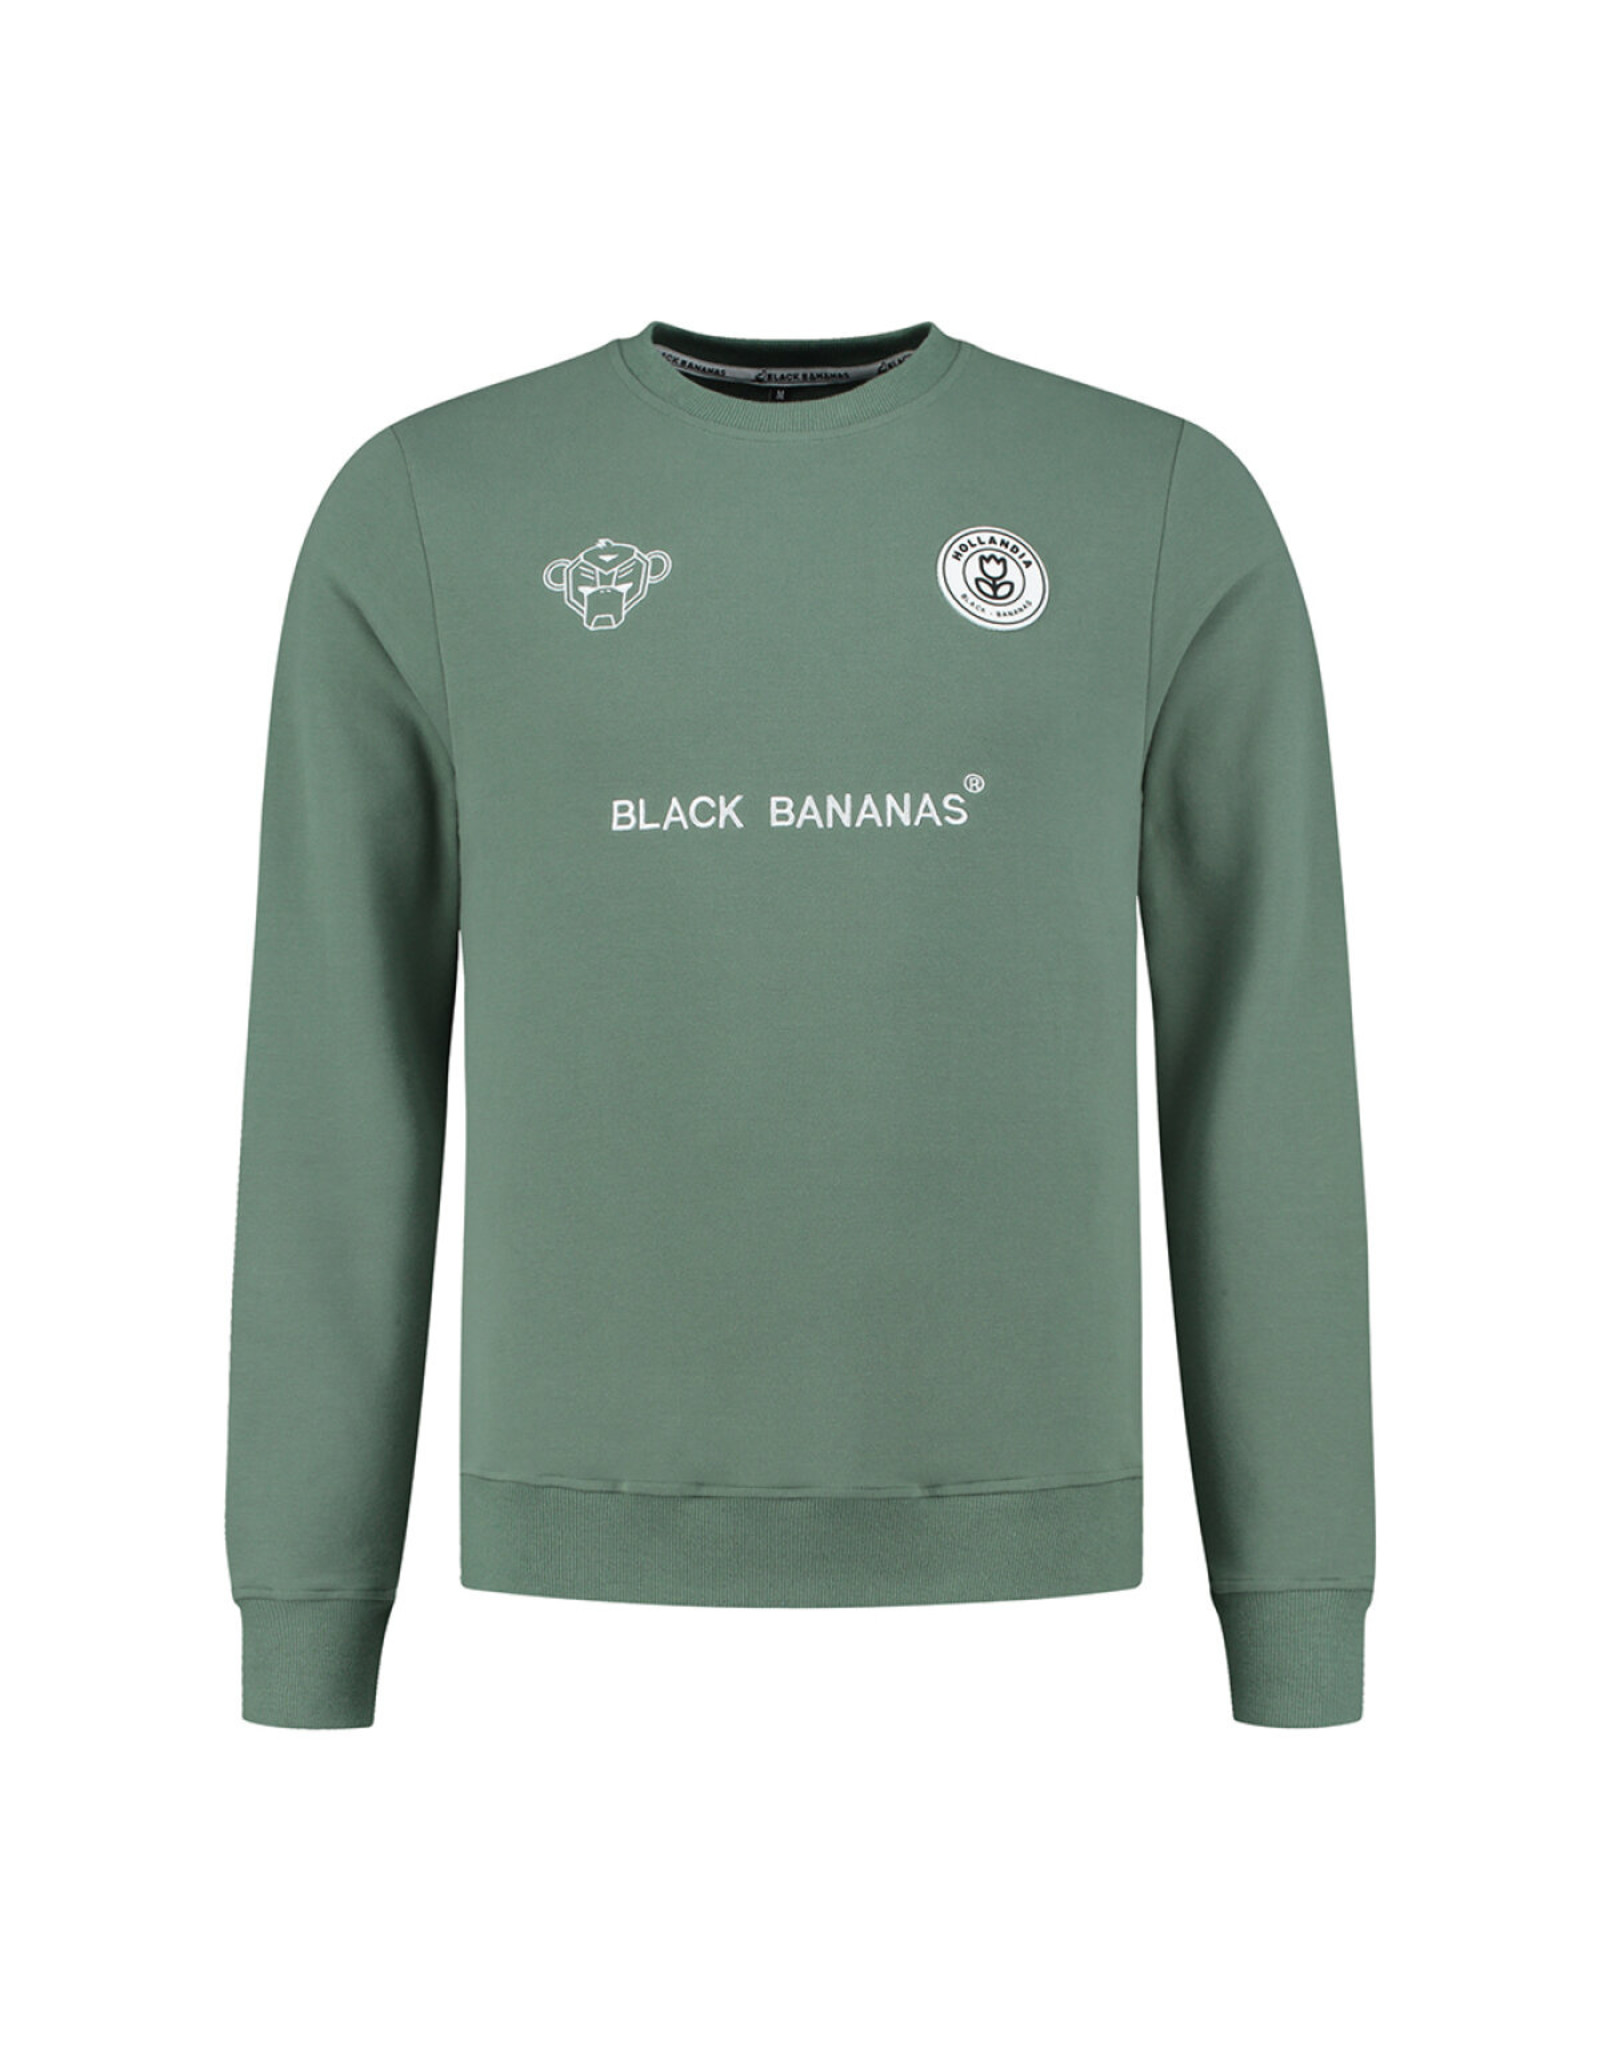 Black Bananas KFW20/019 Sweater